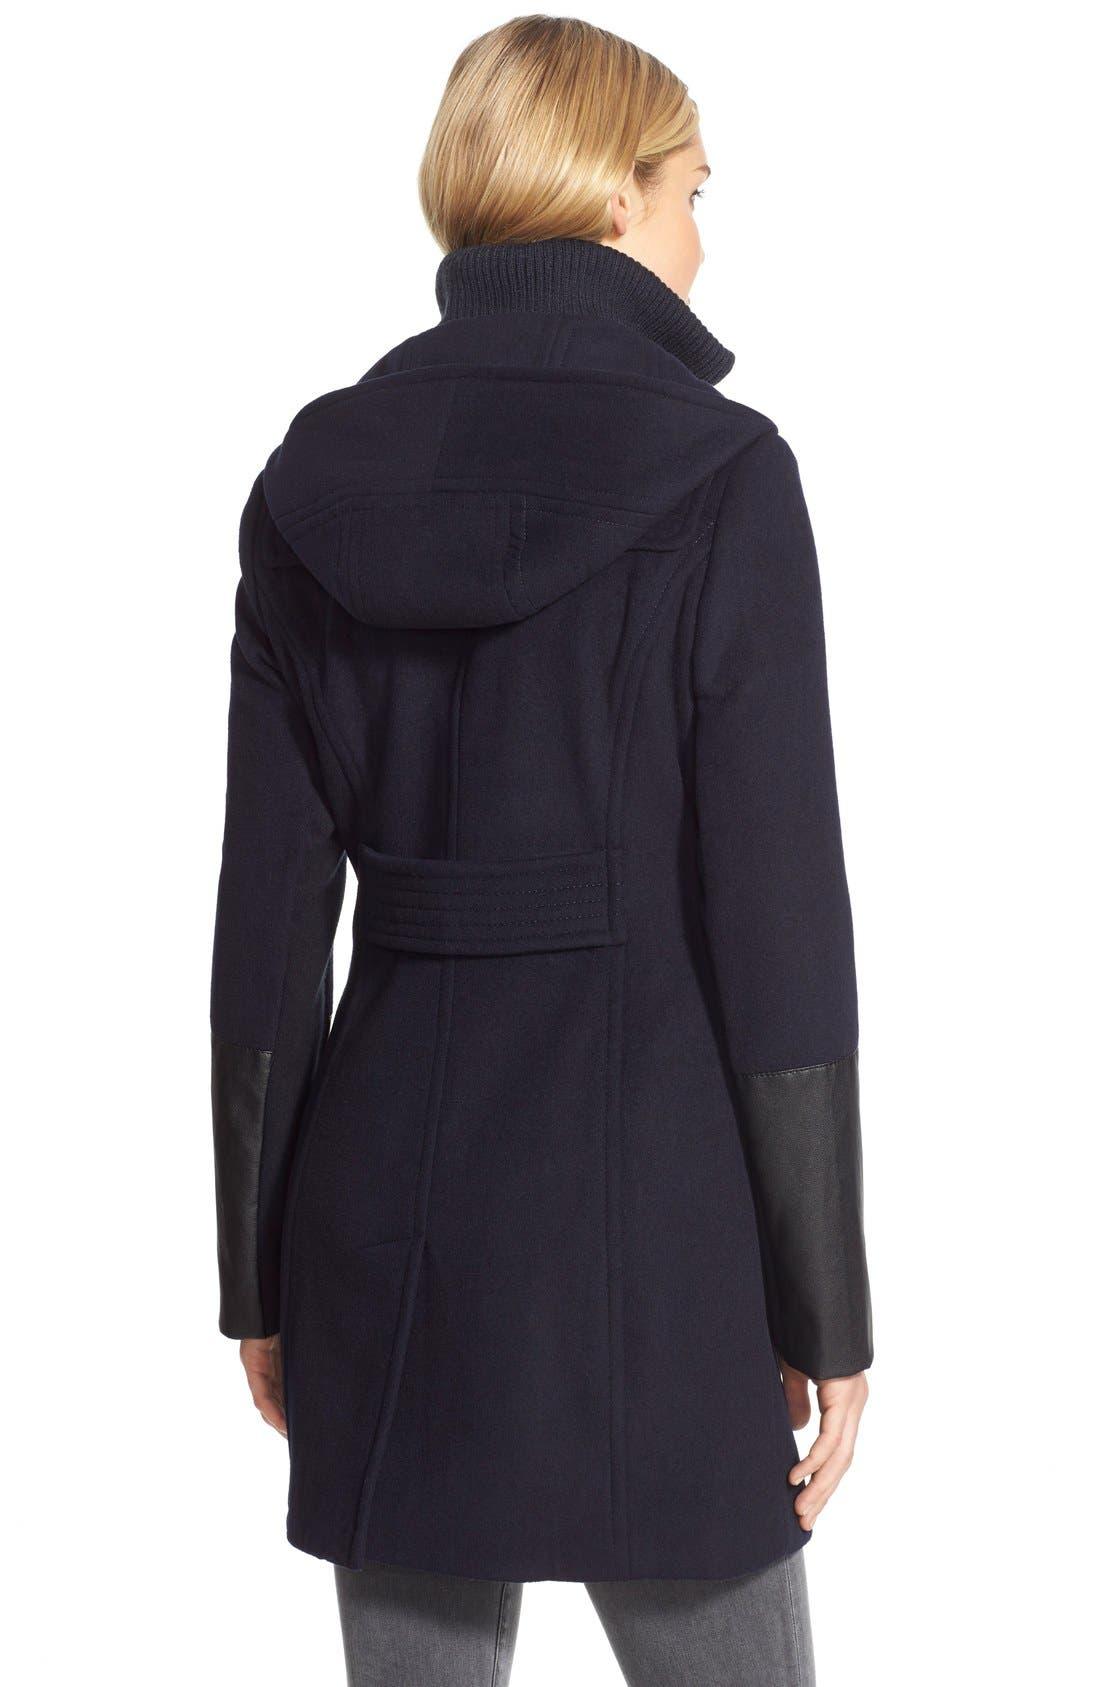 Alternate Image 2  - BCBGMAXAZRIA Faux Leather Trim Wool Blend Duffle Coat with Inset Bib